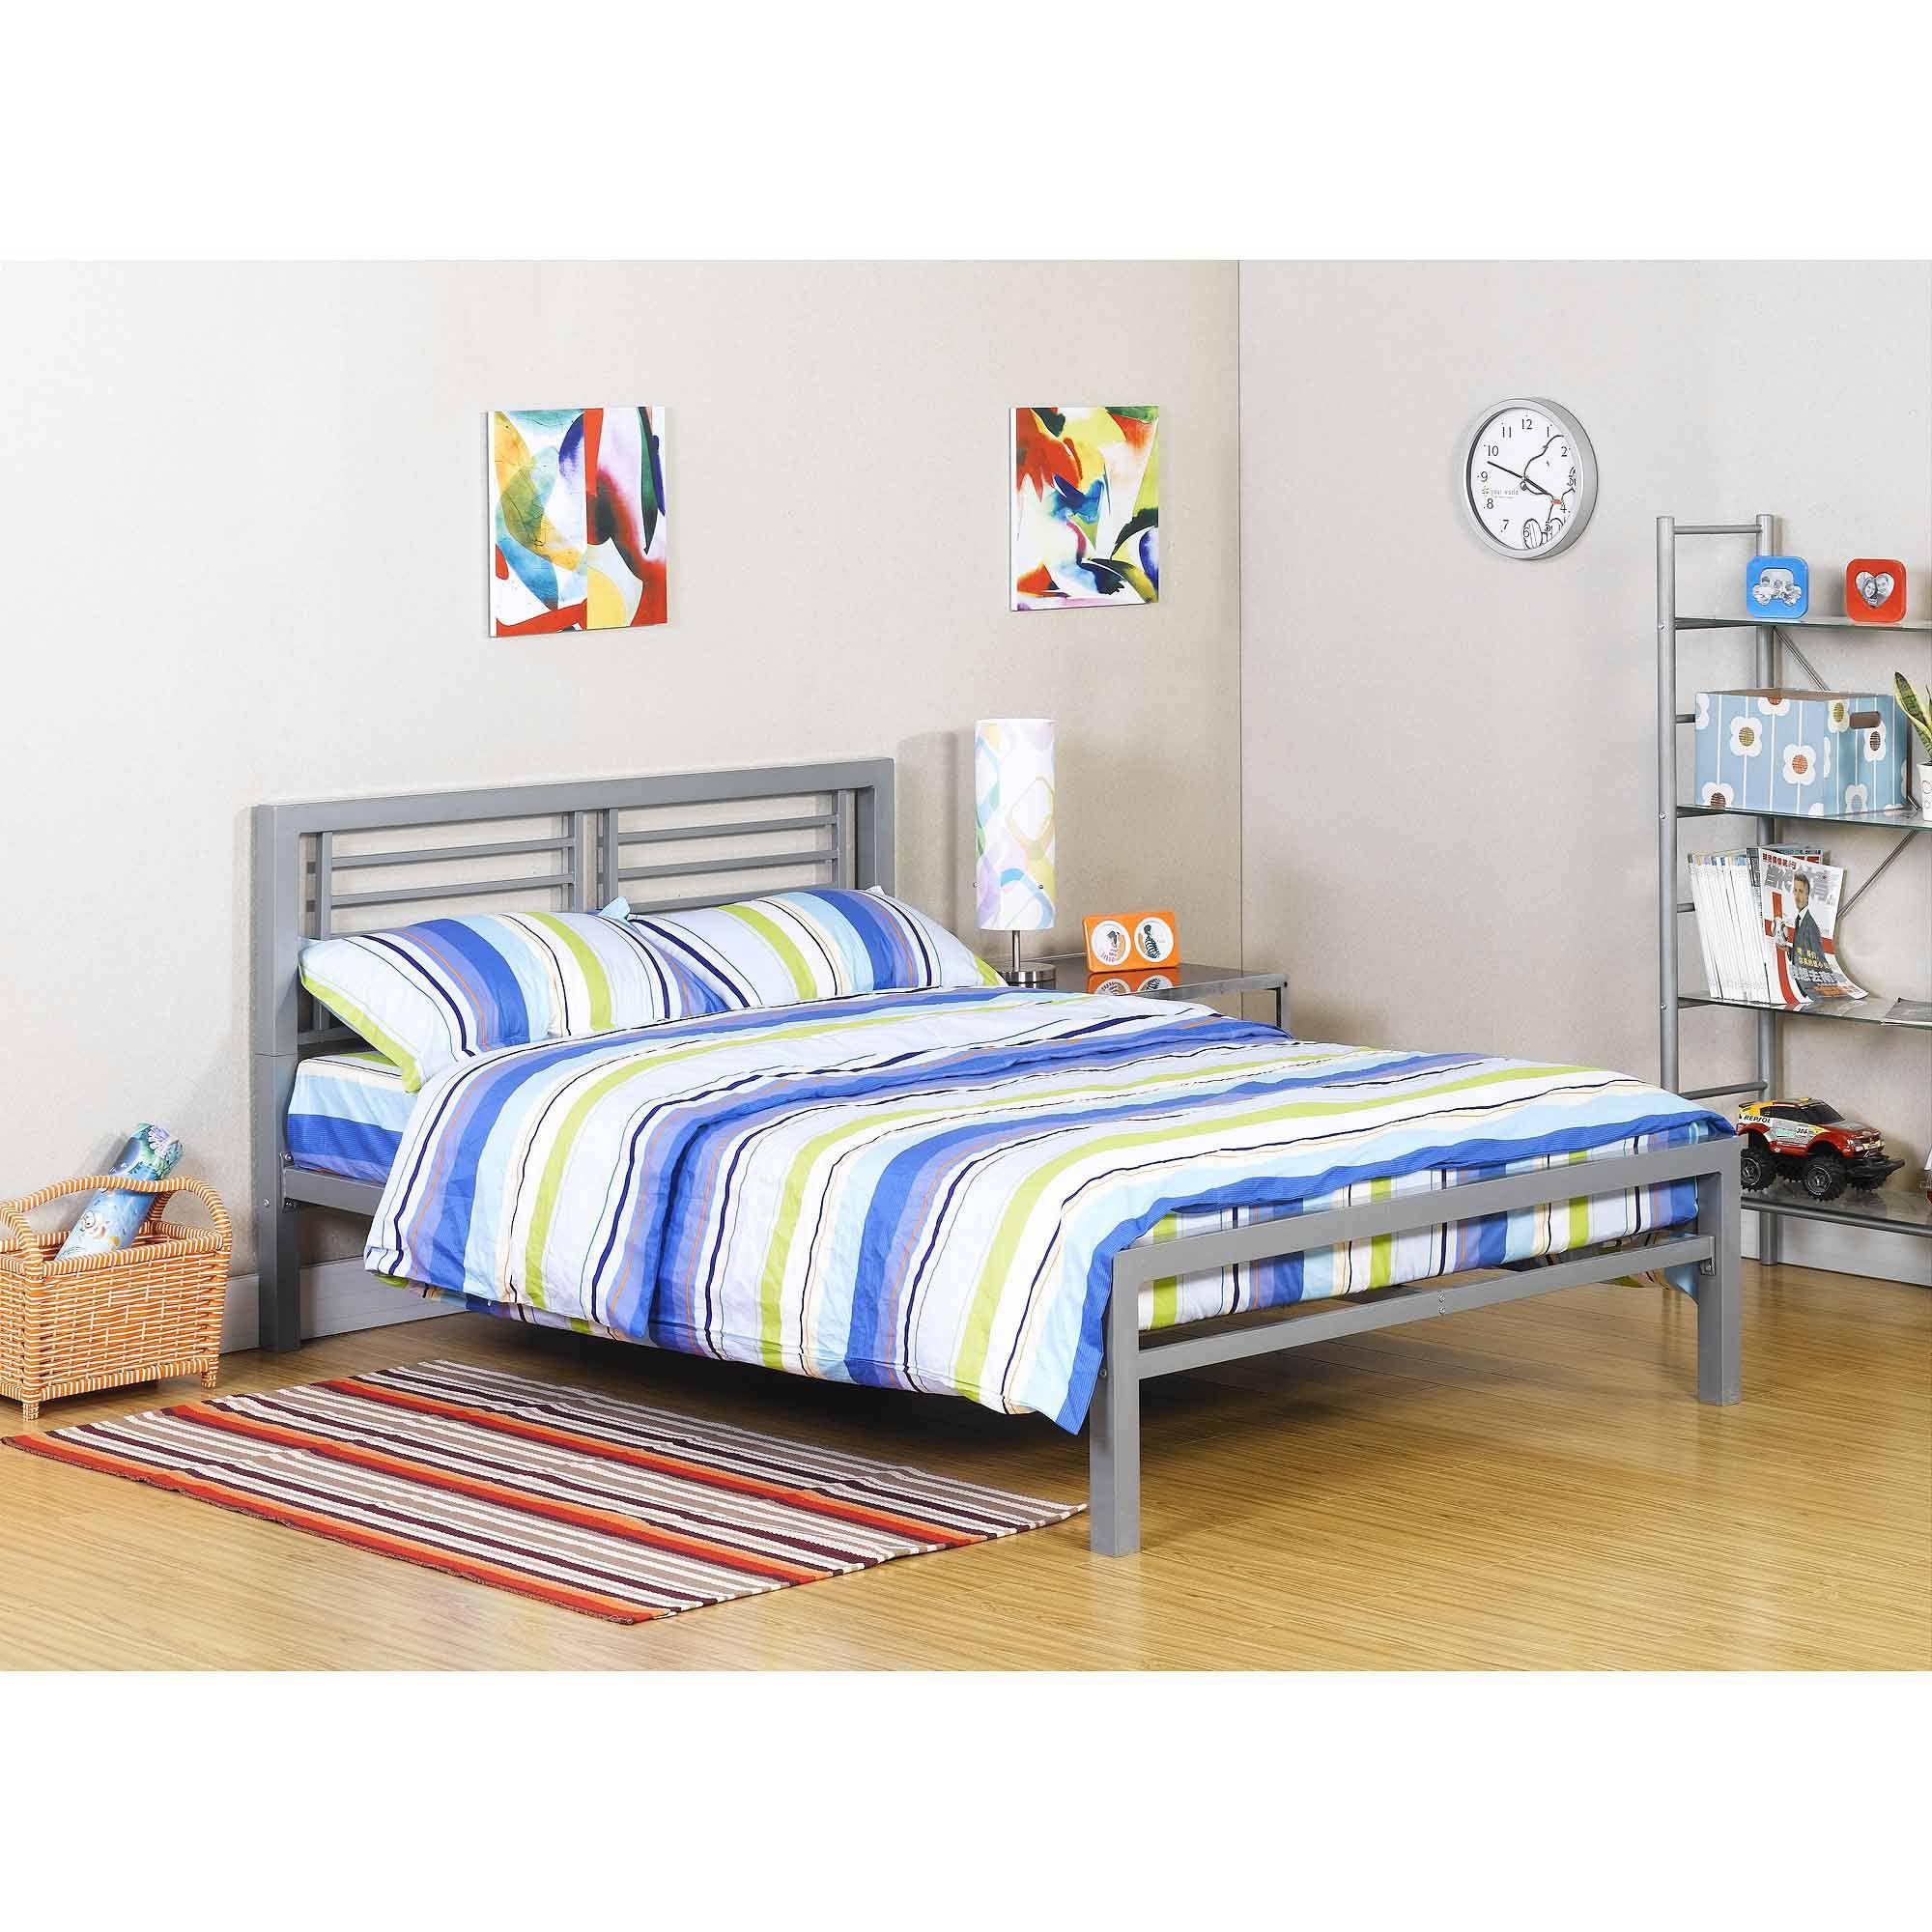 Yourzone Kids Metal Platform Bed Multiple Sizes Multiple Colors